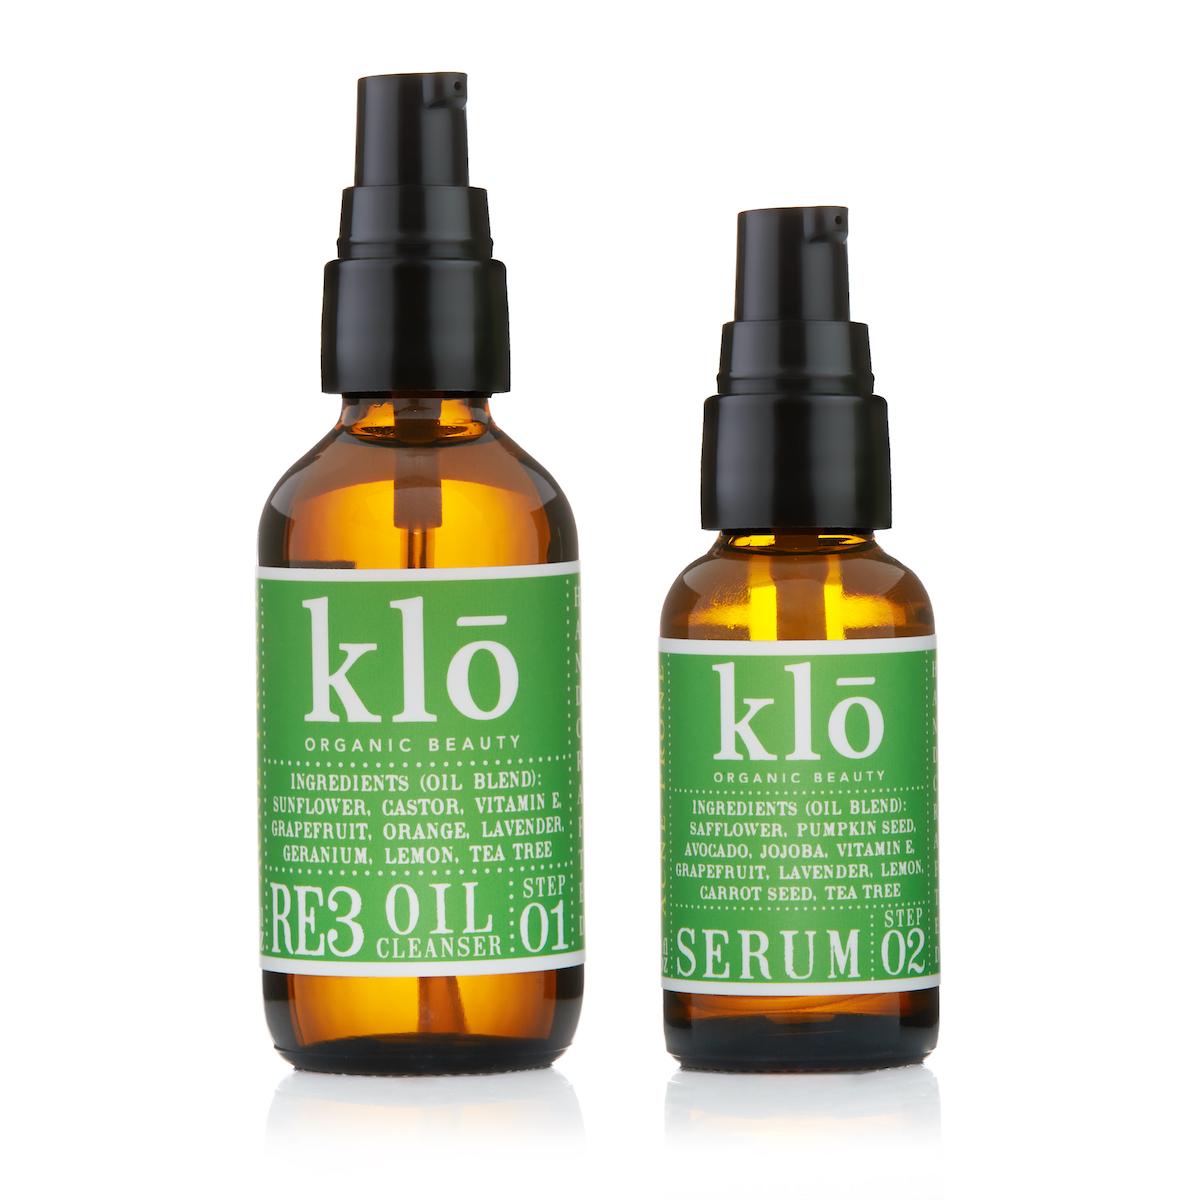 Klo Organic Beauty Acne-Prone Duo